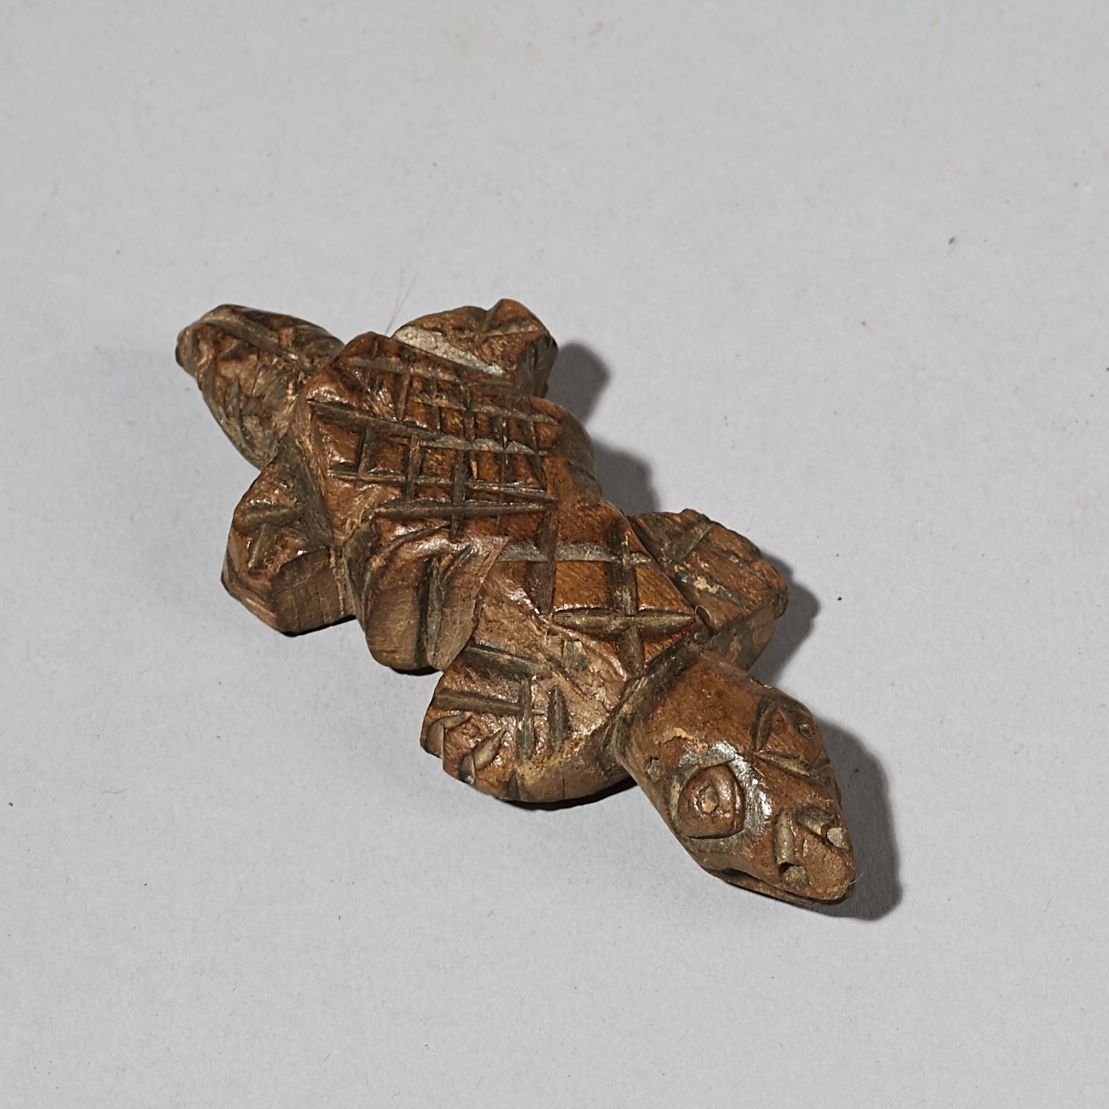 A TURTLE ANIMAL TOTEM PENDANT, MOSSI TRIBE BURKINA FASO W AFRICA ( No 4131 )